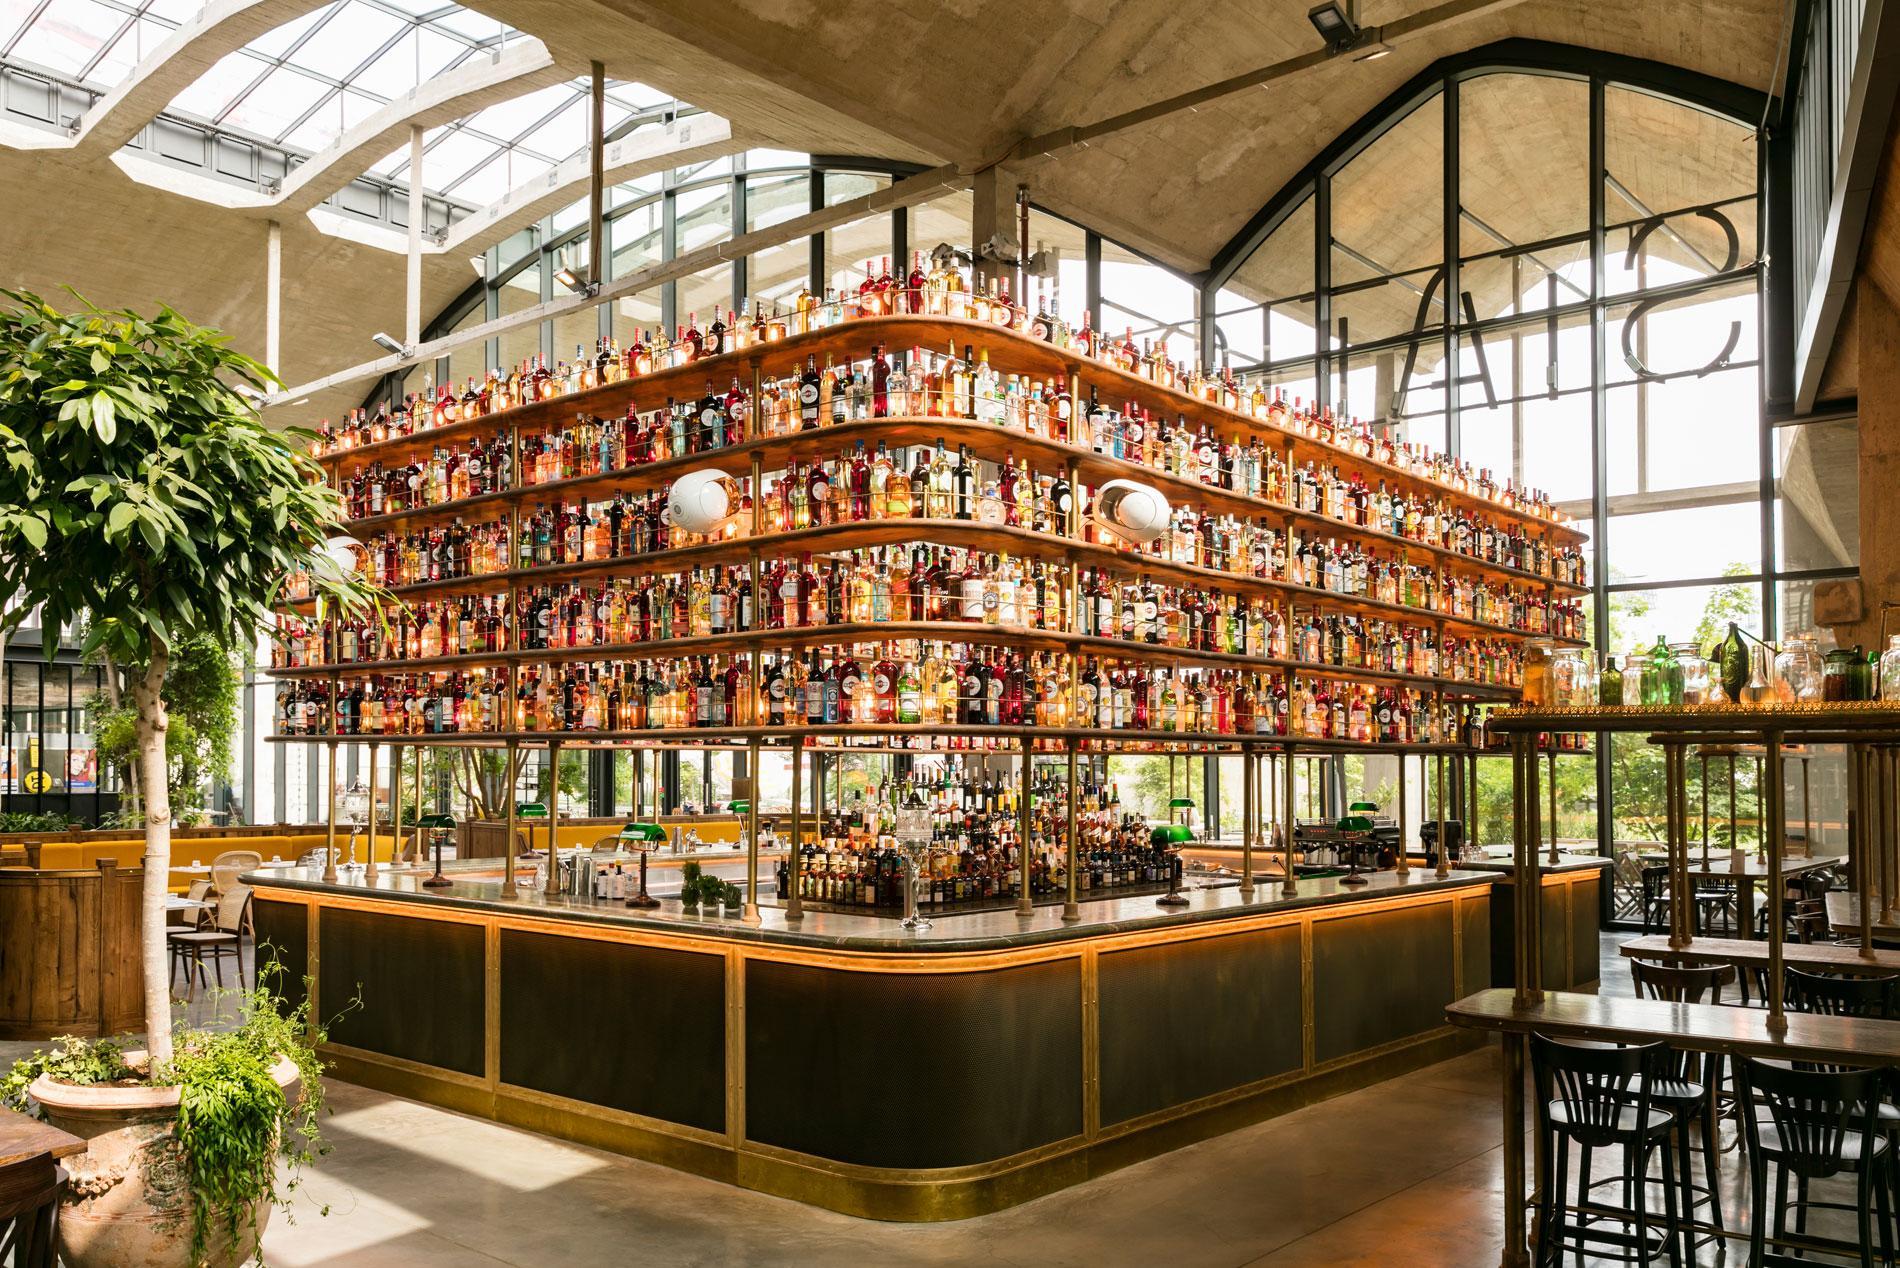 Station Restaurant Paris